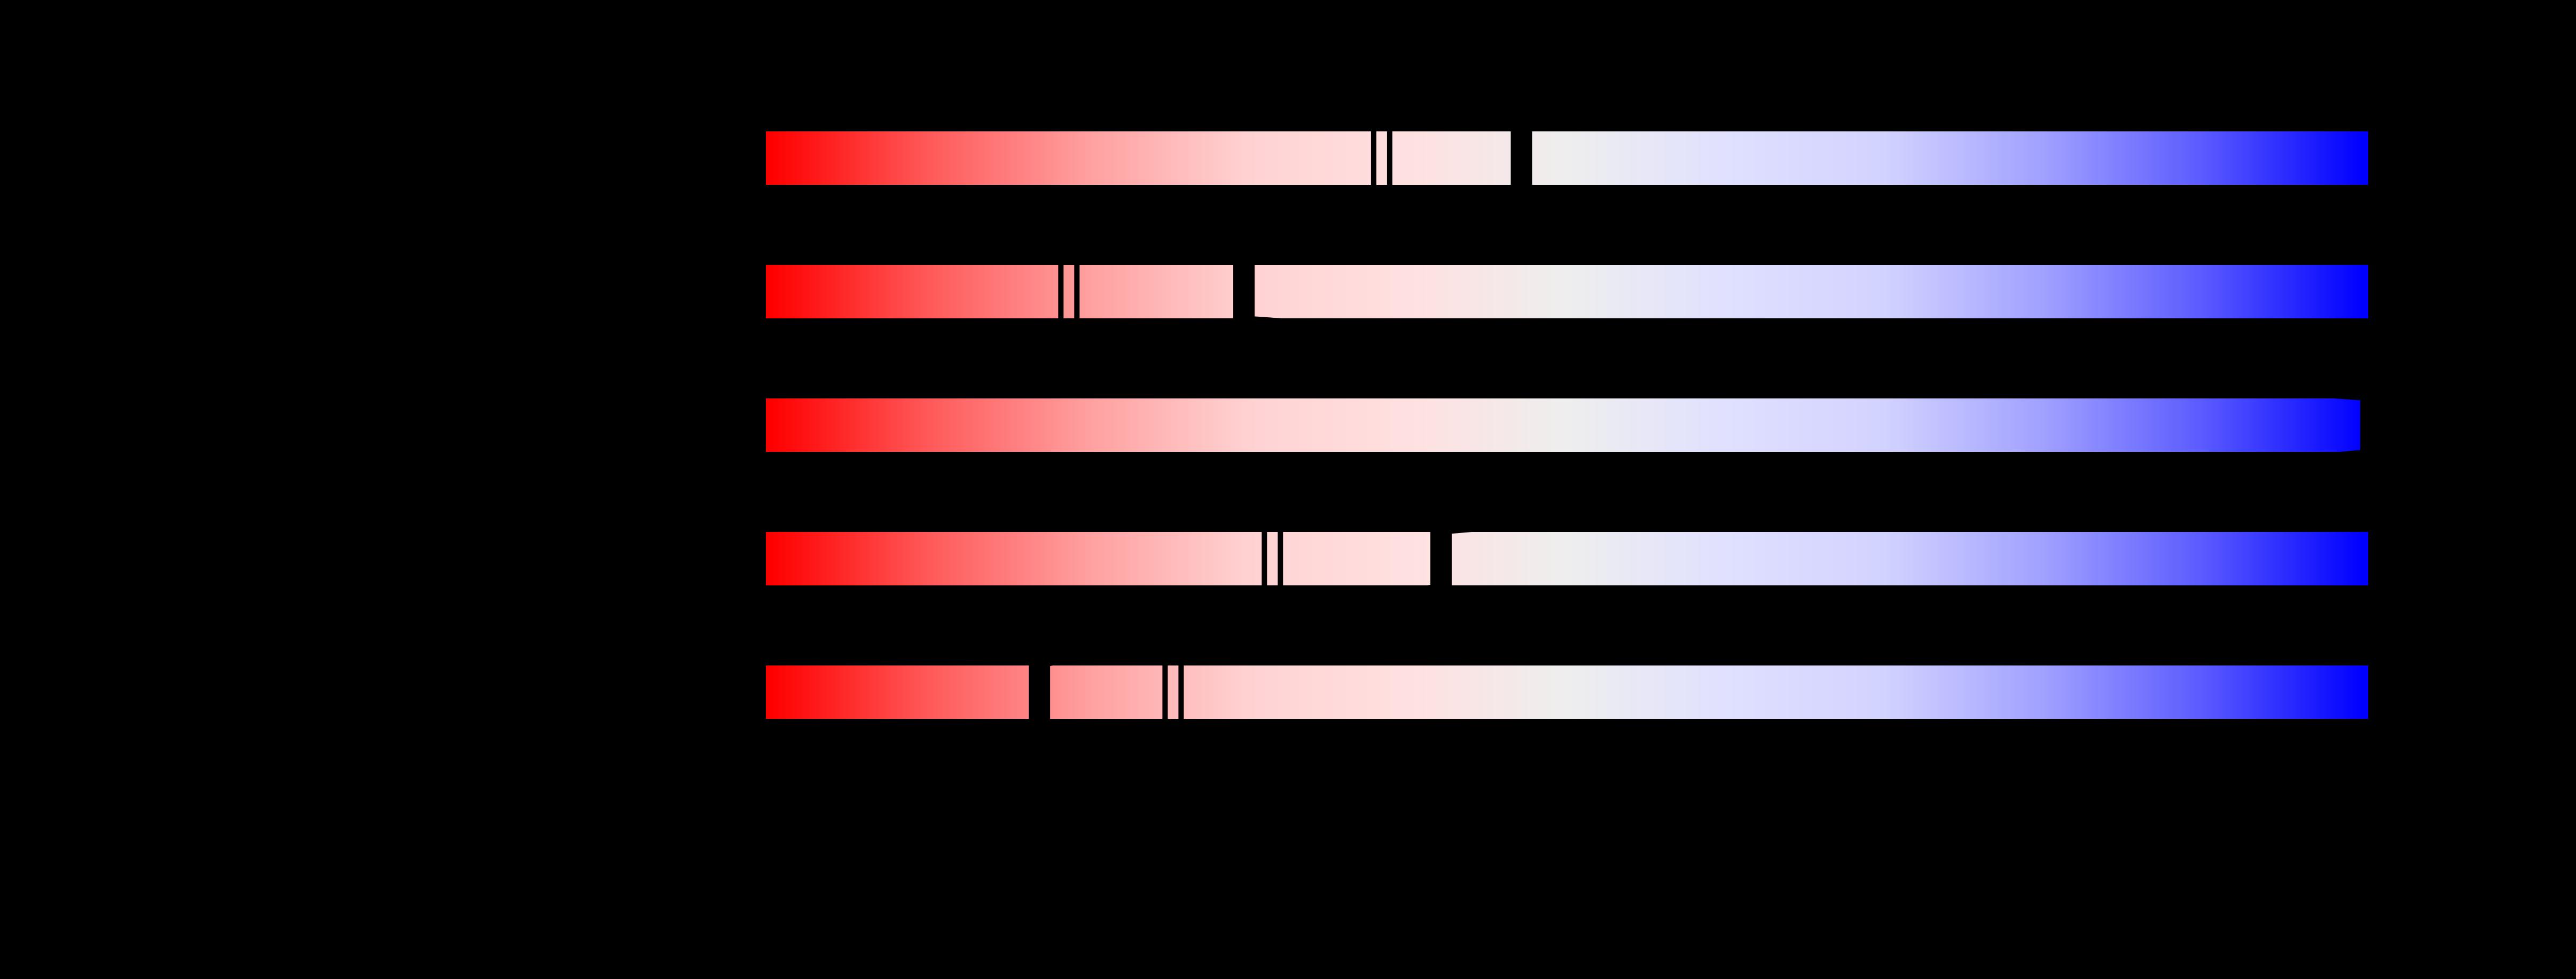 RCSB PDB - 5XGA: Crystal structure of the EnvZ periplasmic